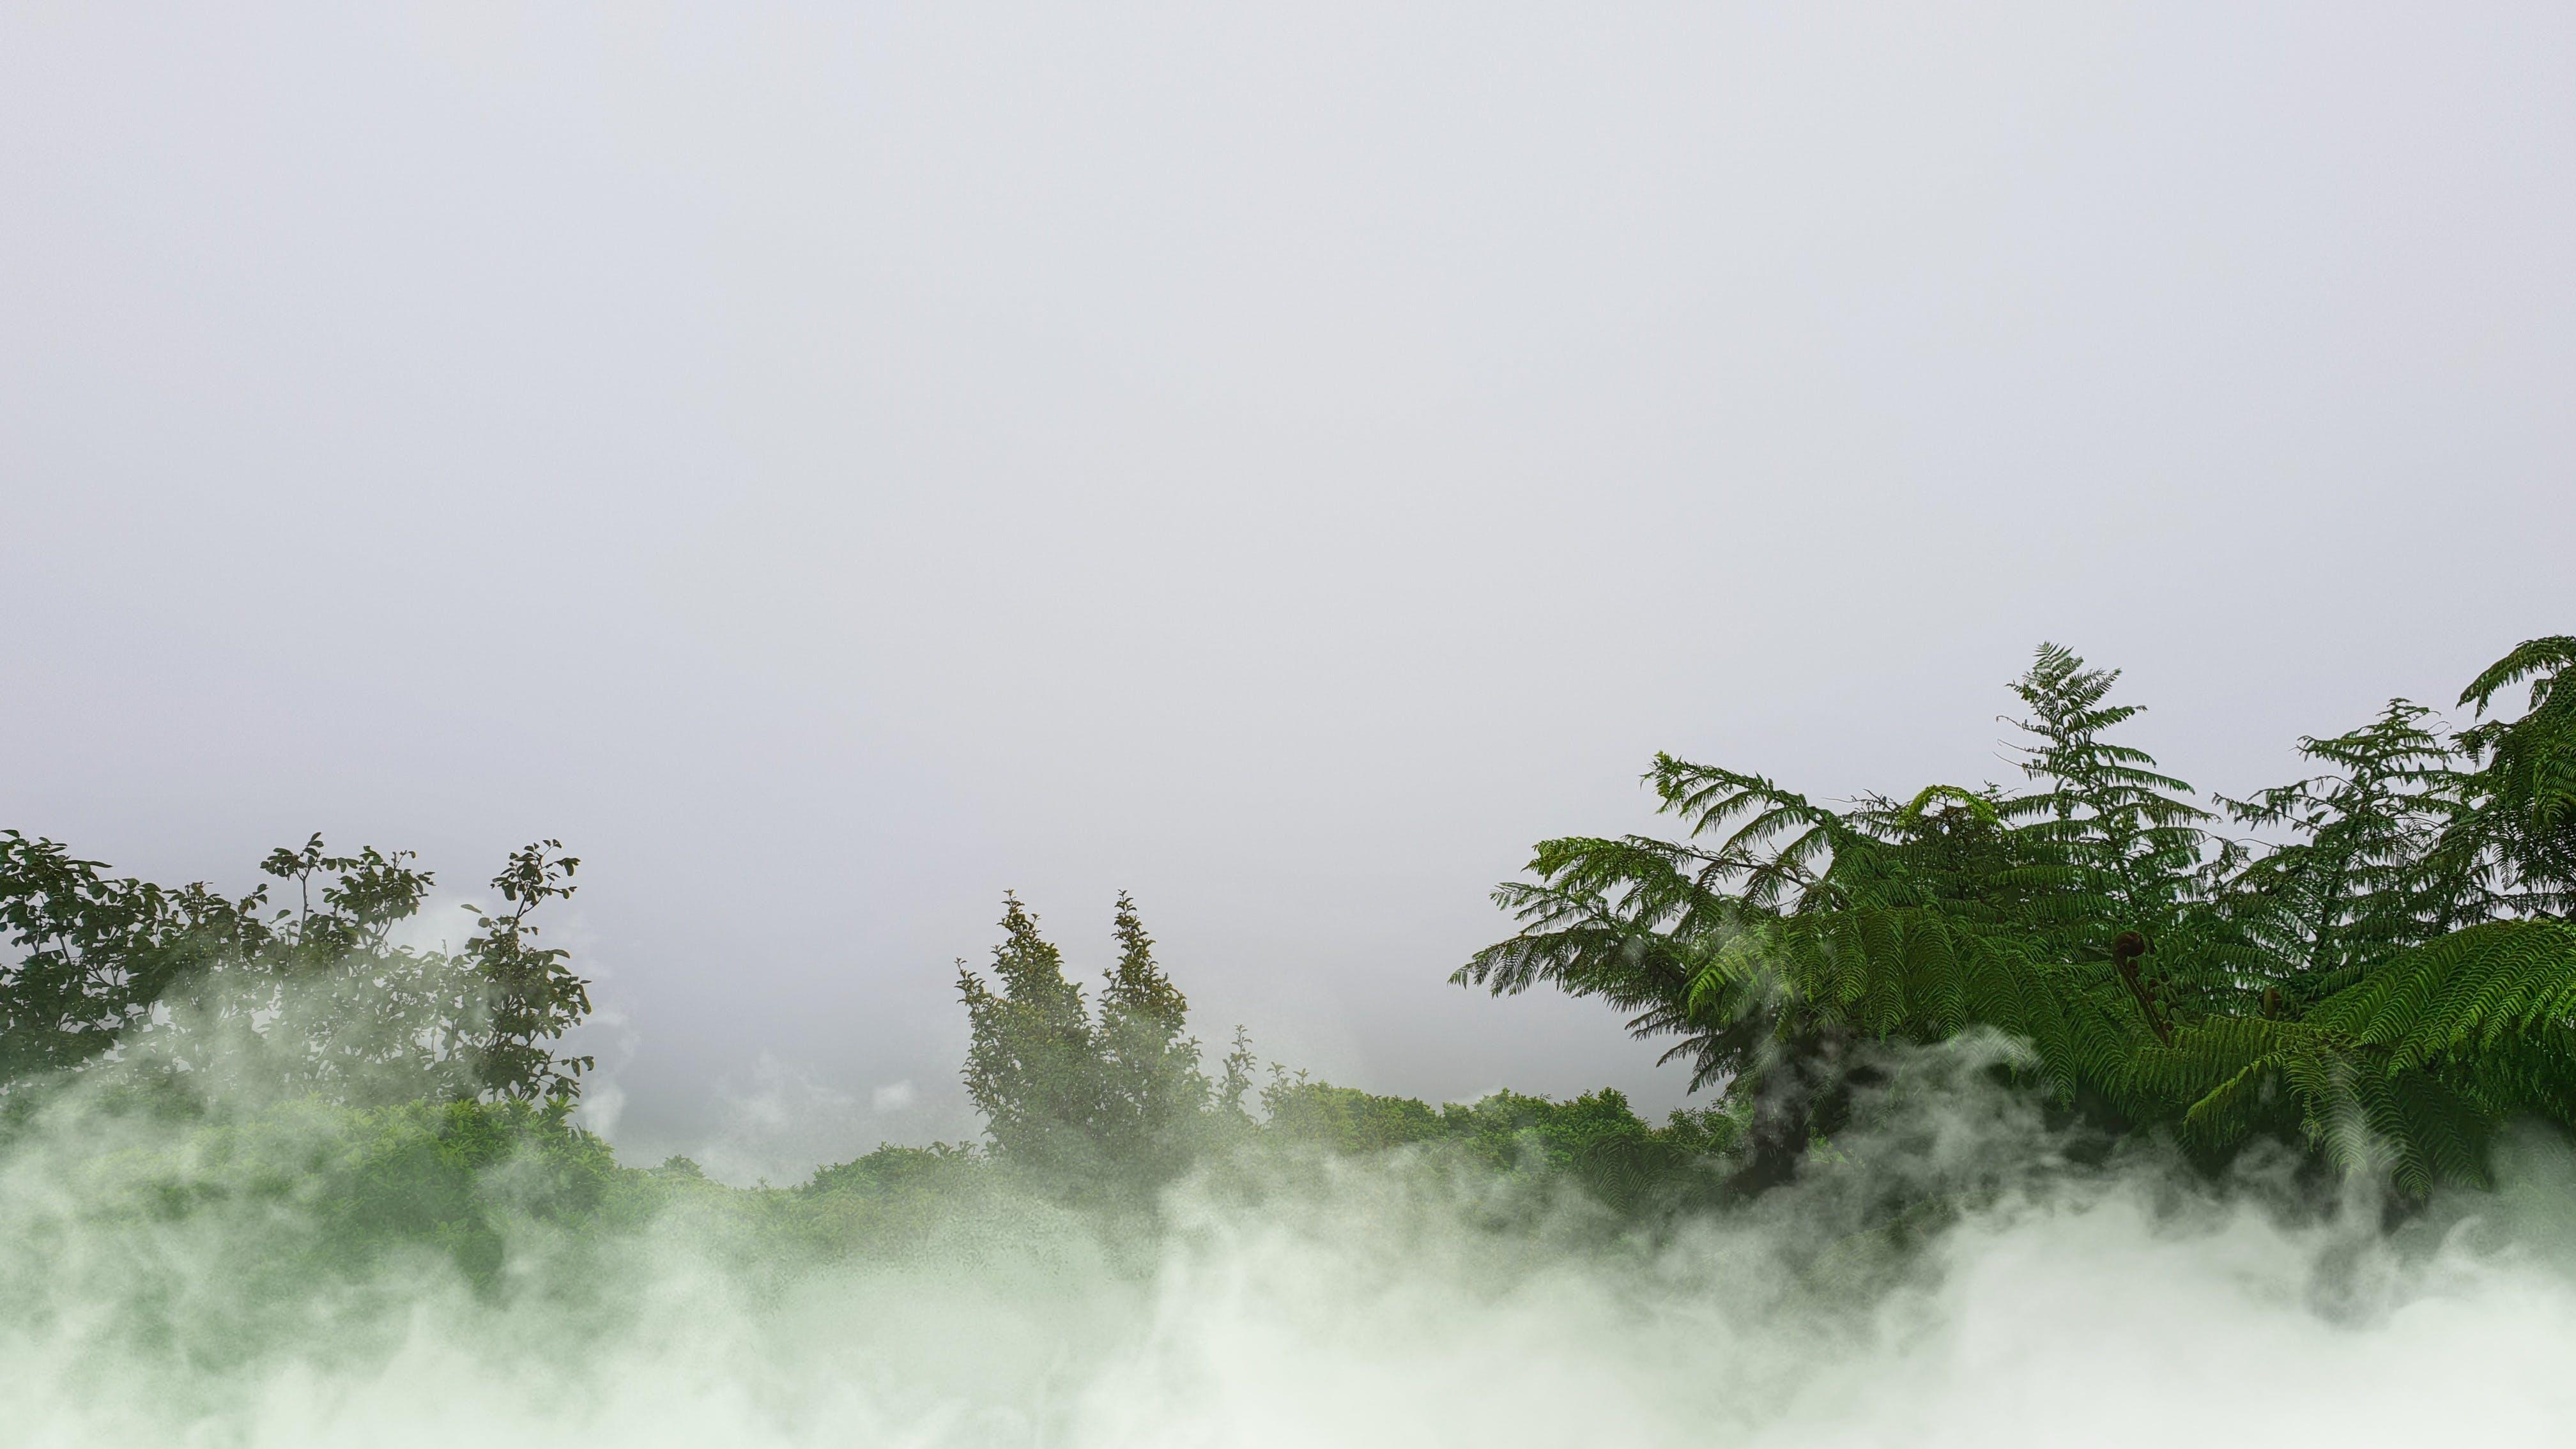 Kostenloses Stock Foto zu bäume, baumwipfel, bewaldung, bewölkt